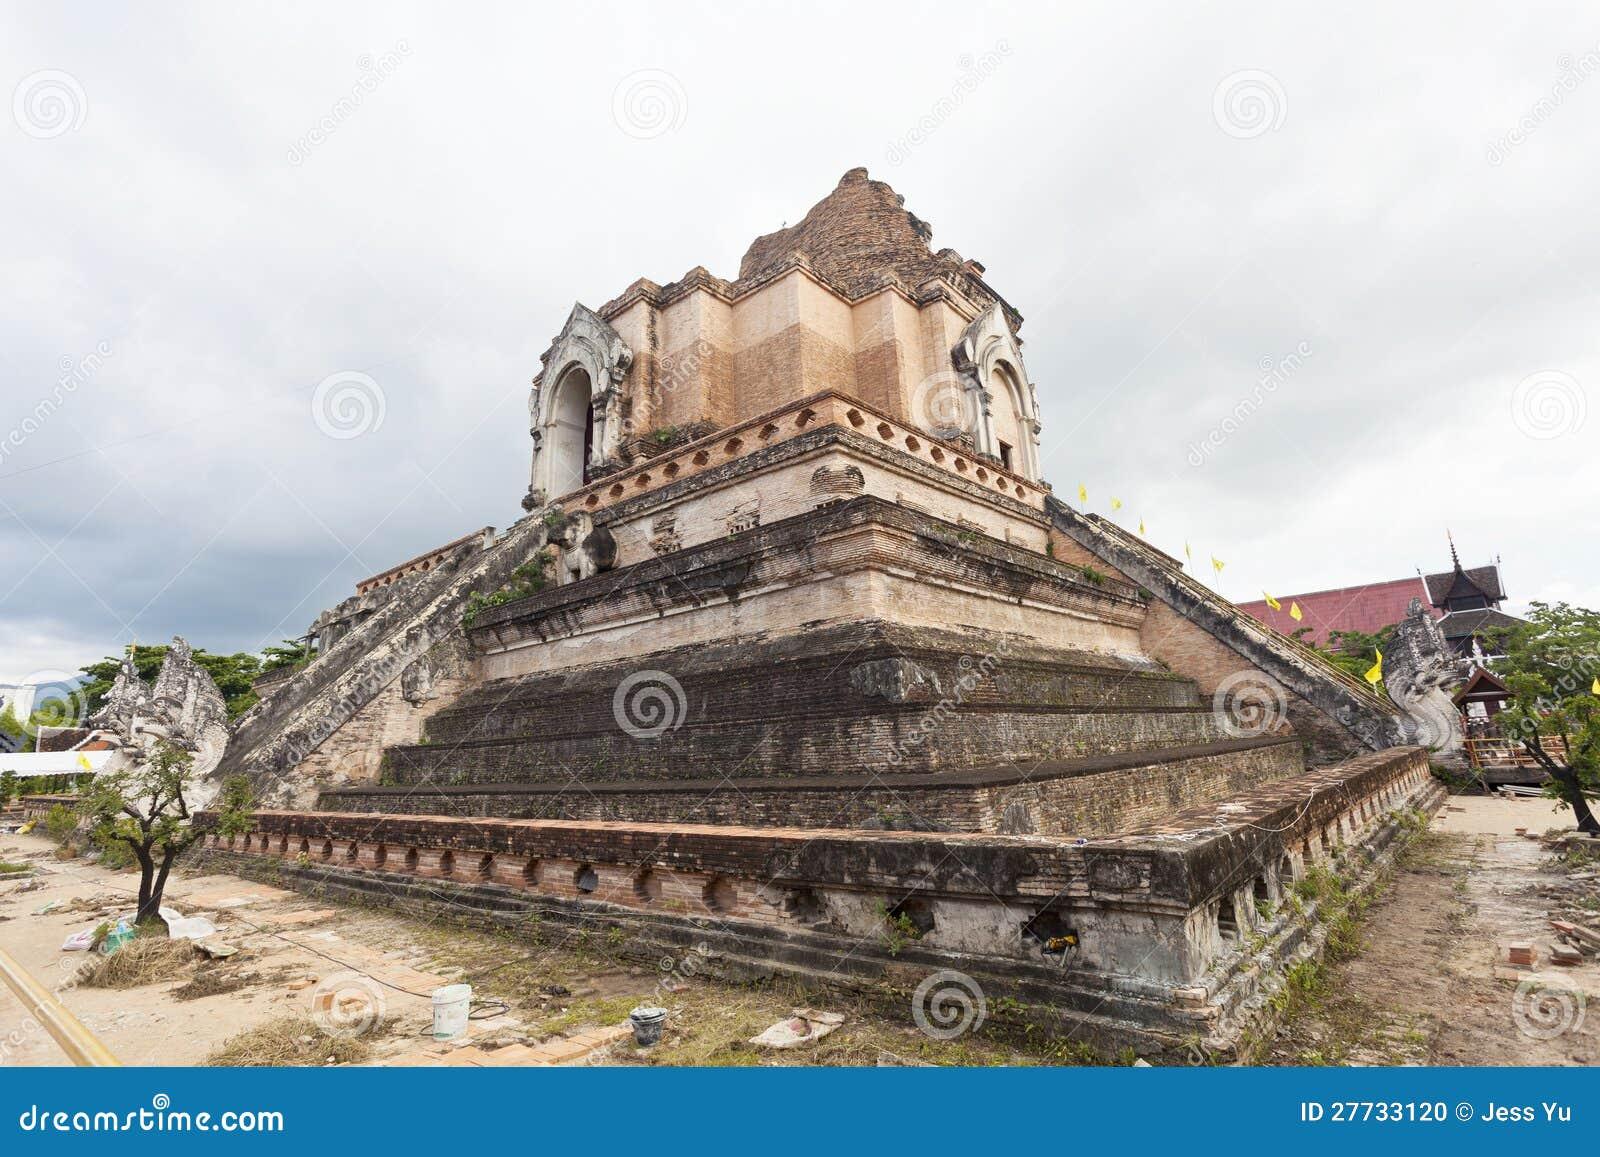 Wat Chedi Luang Tempel in Chiang Mai, Thailand.